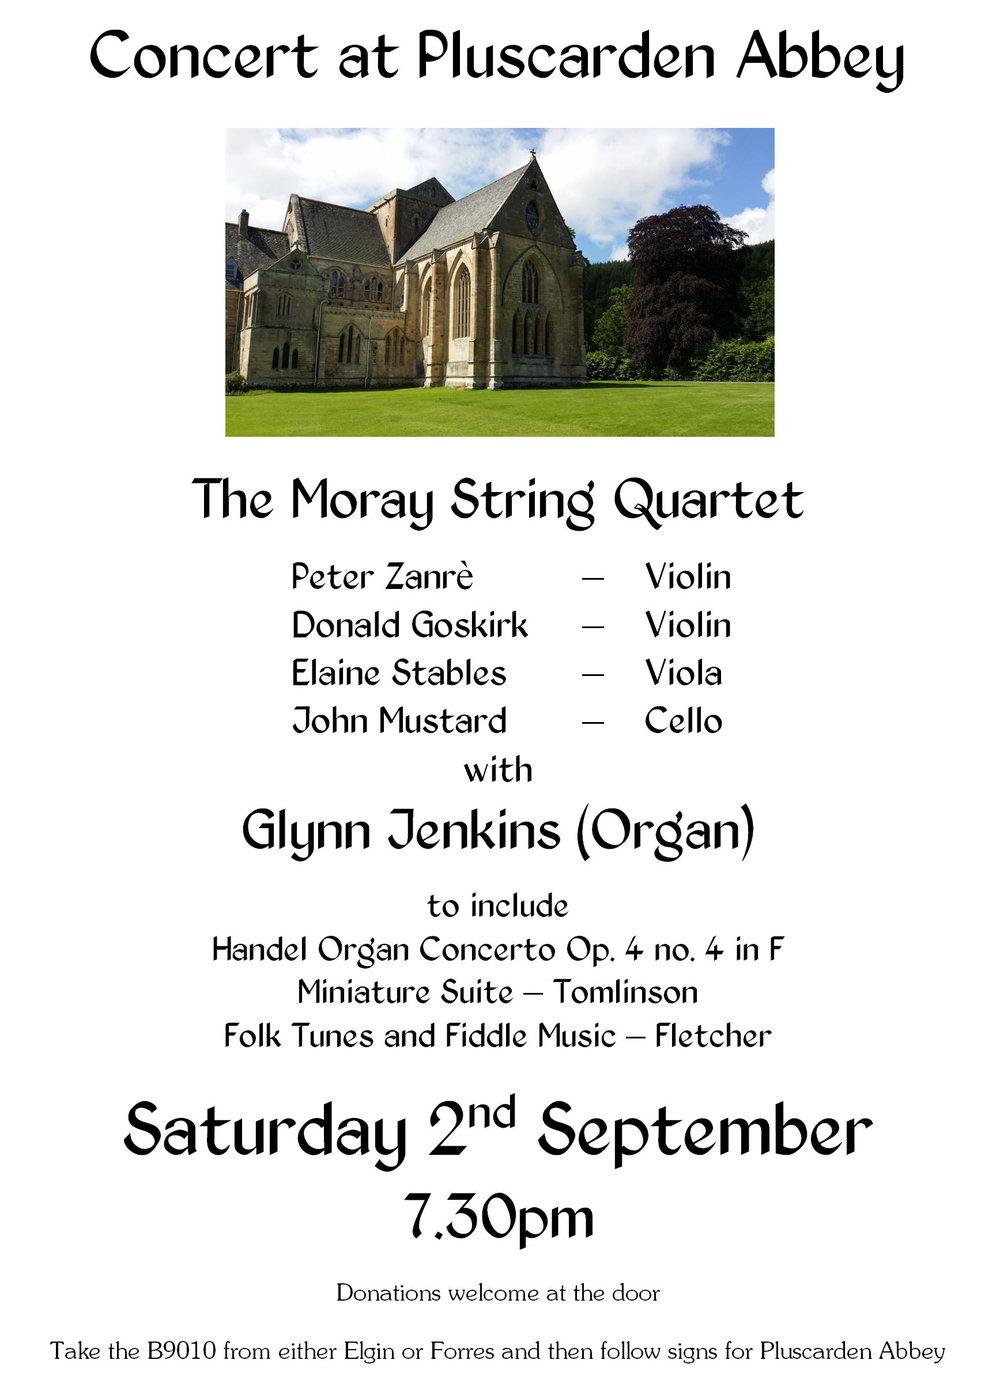 Moray String Quartet at Pluscarden Abbey 2017